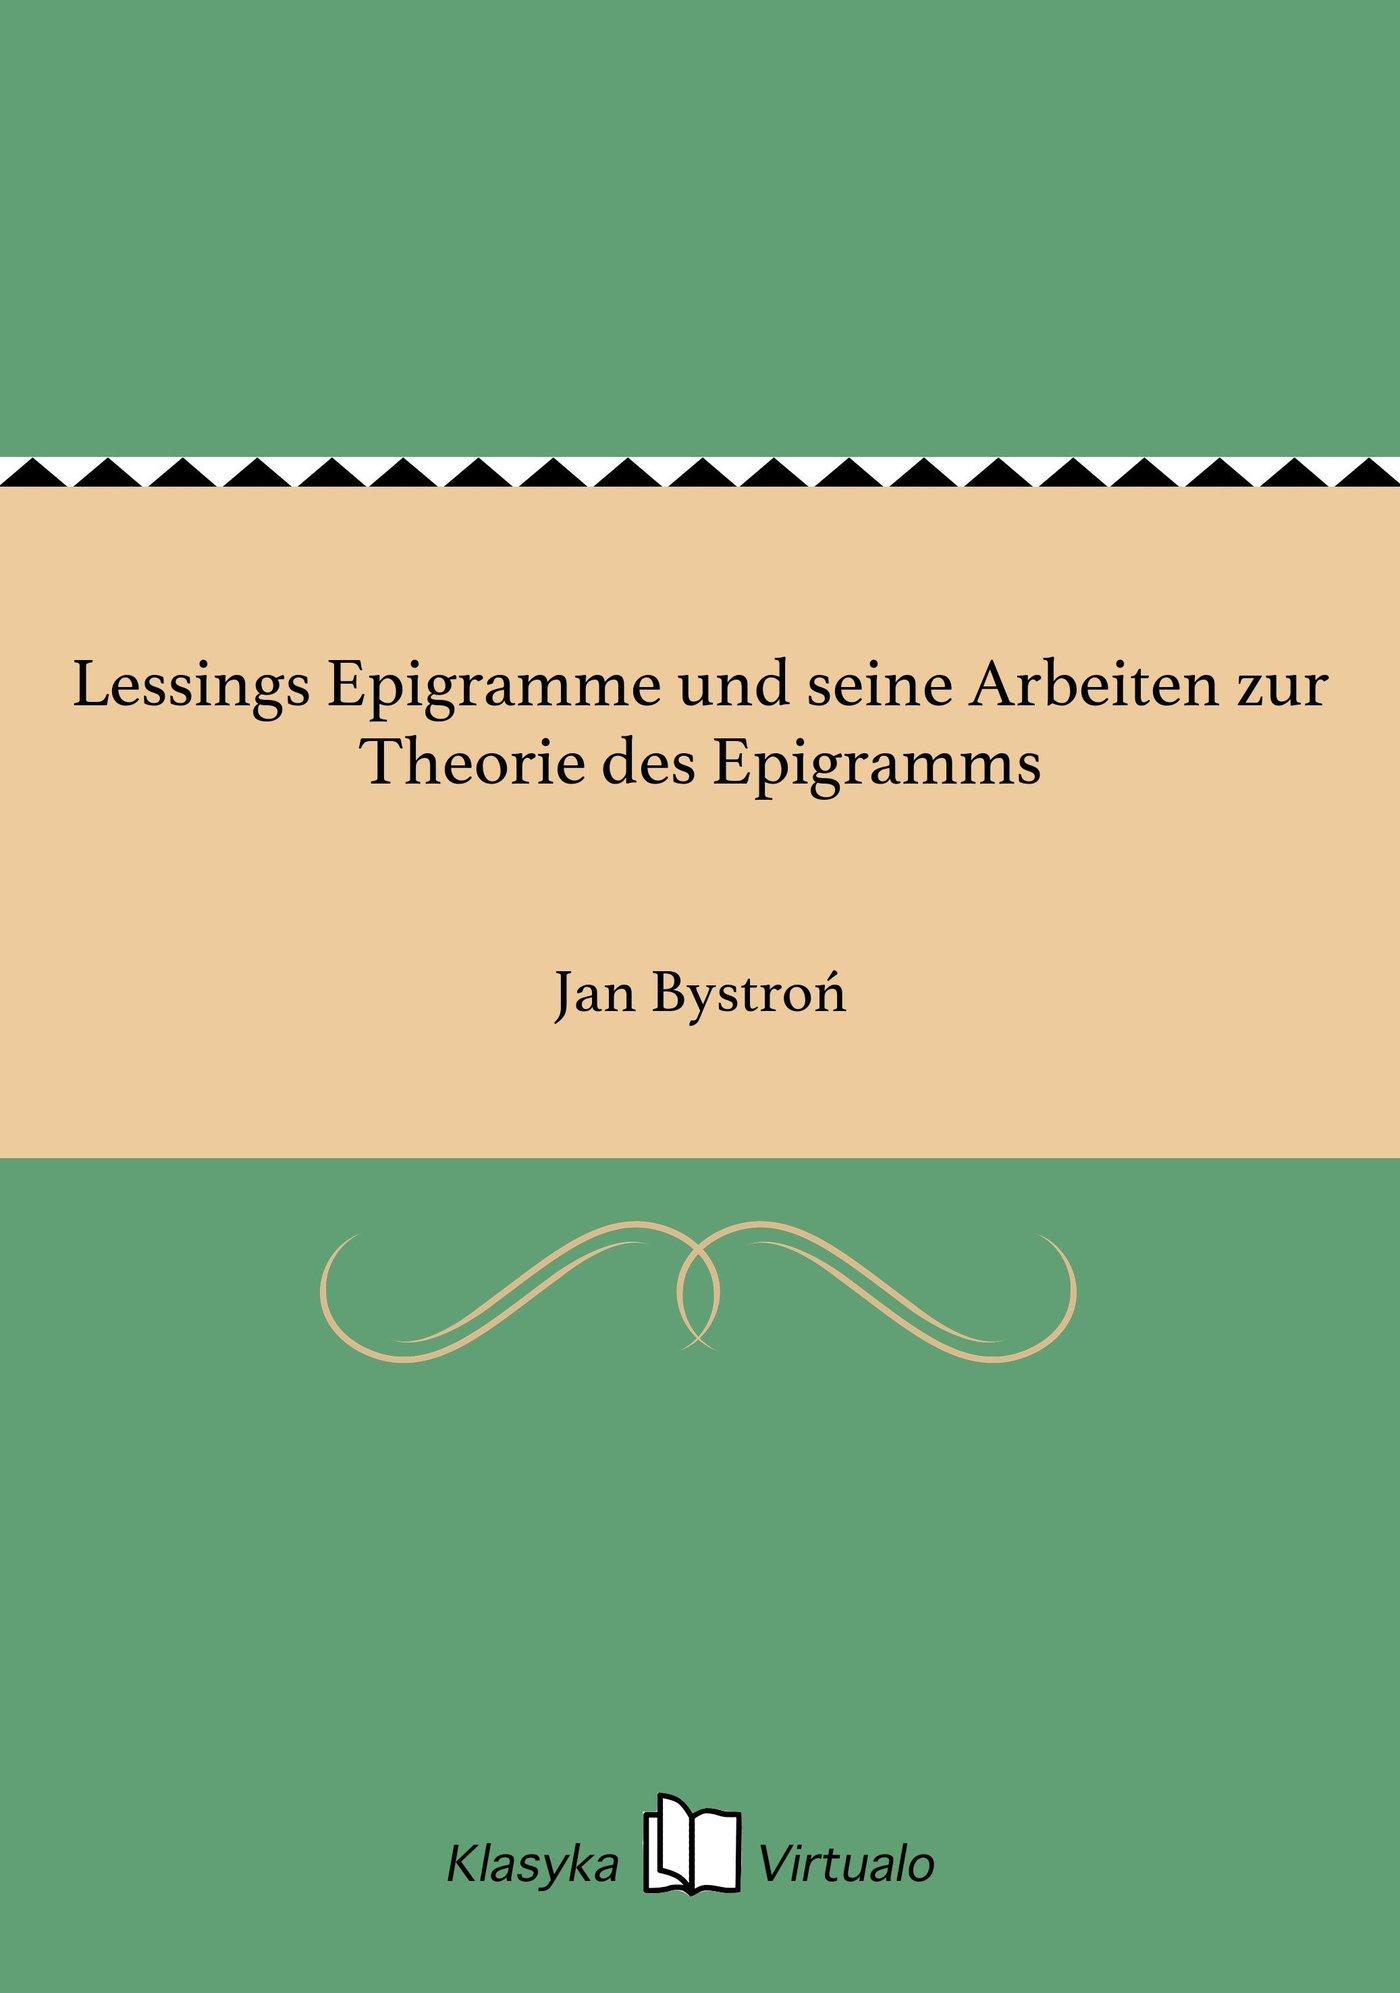 Lessings Epigramme und seine Arbeiten zur Theorie des Epigramms - Ebook (Książka na Kindle) do pobrania w formacie MOBI